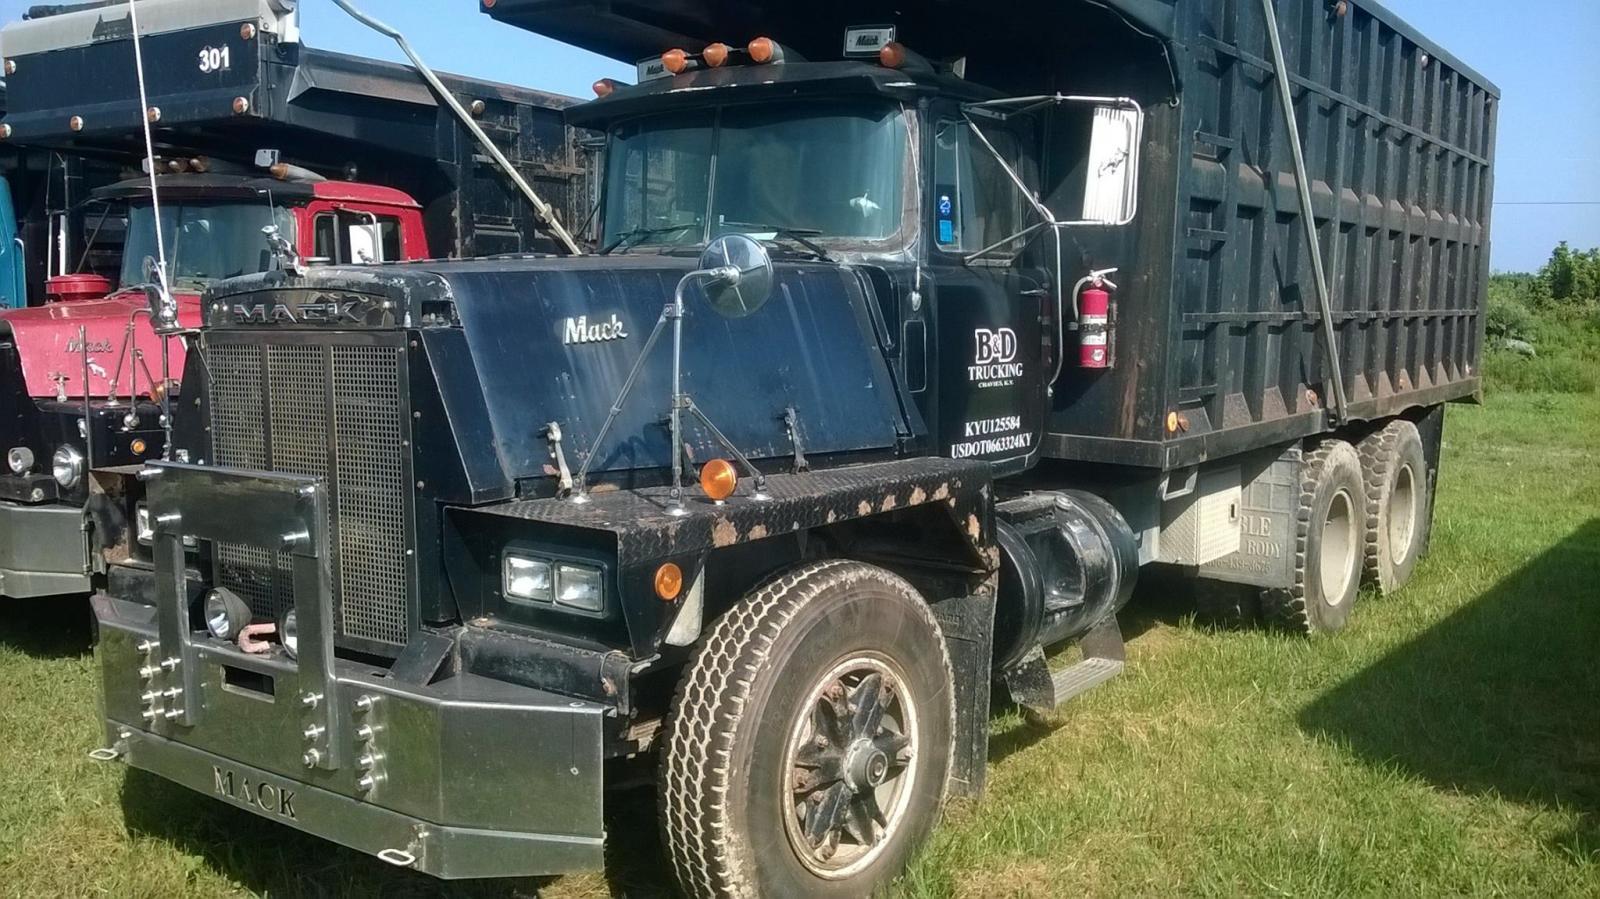 Trucks For Sale: Selling My Fleet Of 15 Mack Coal Trucks.